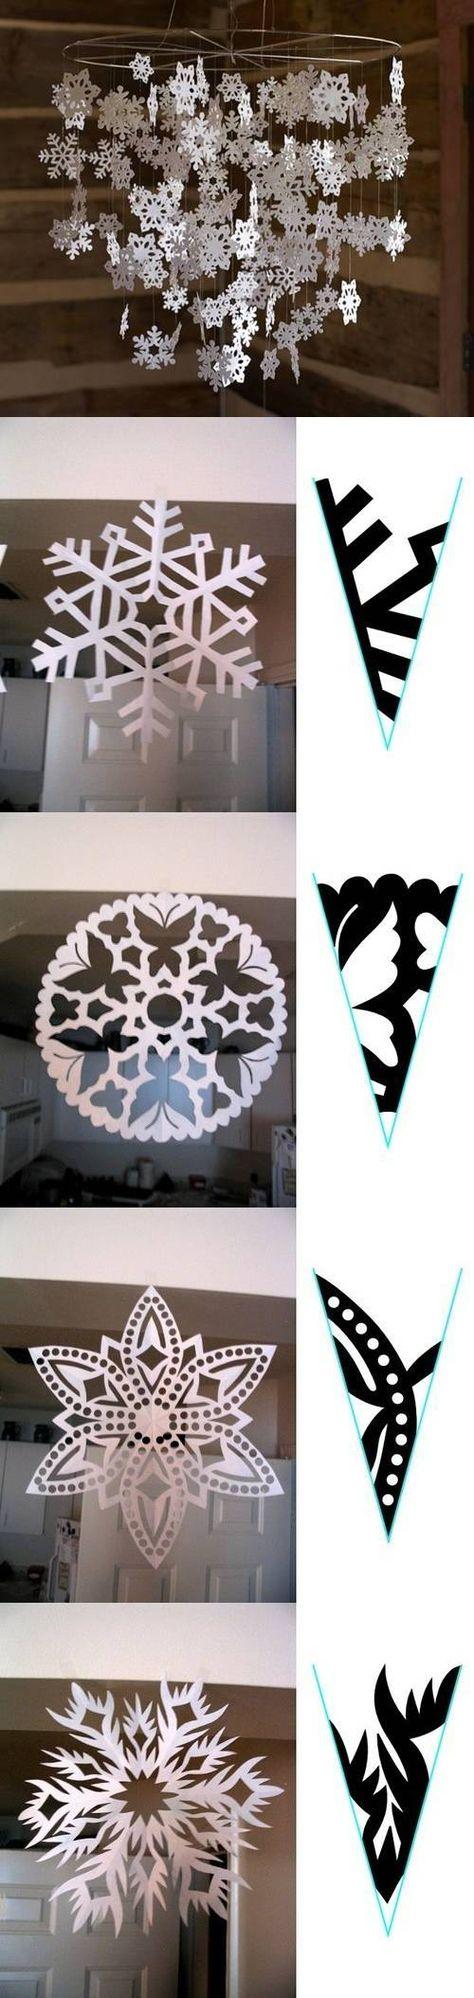 DIY Snowflake Paper Pattern